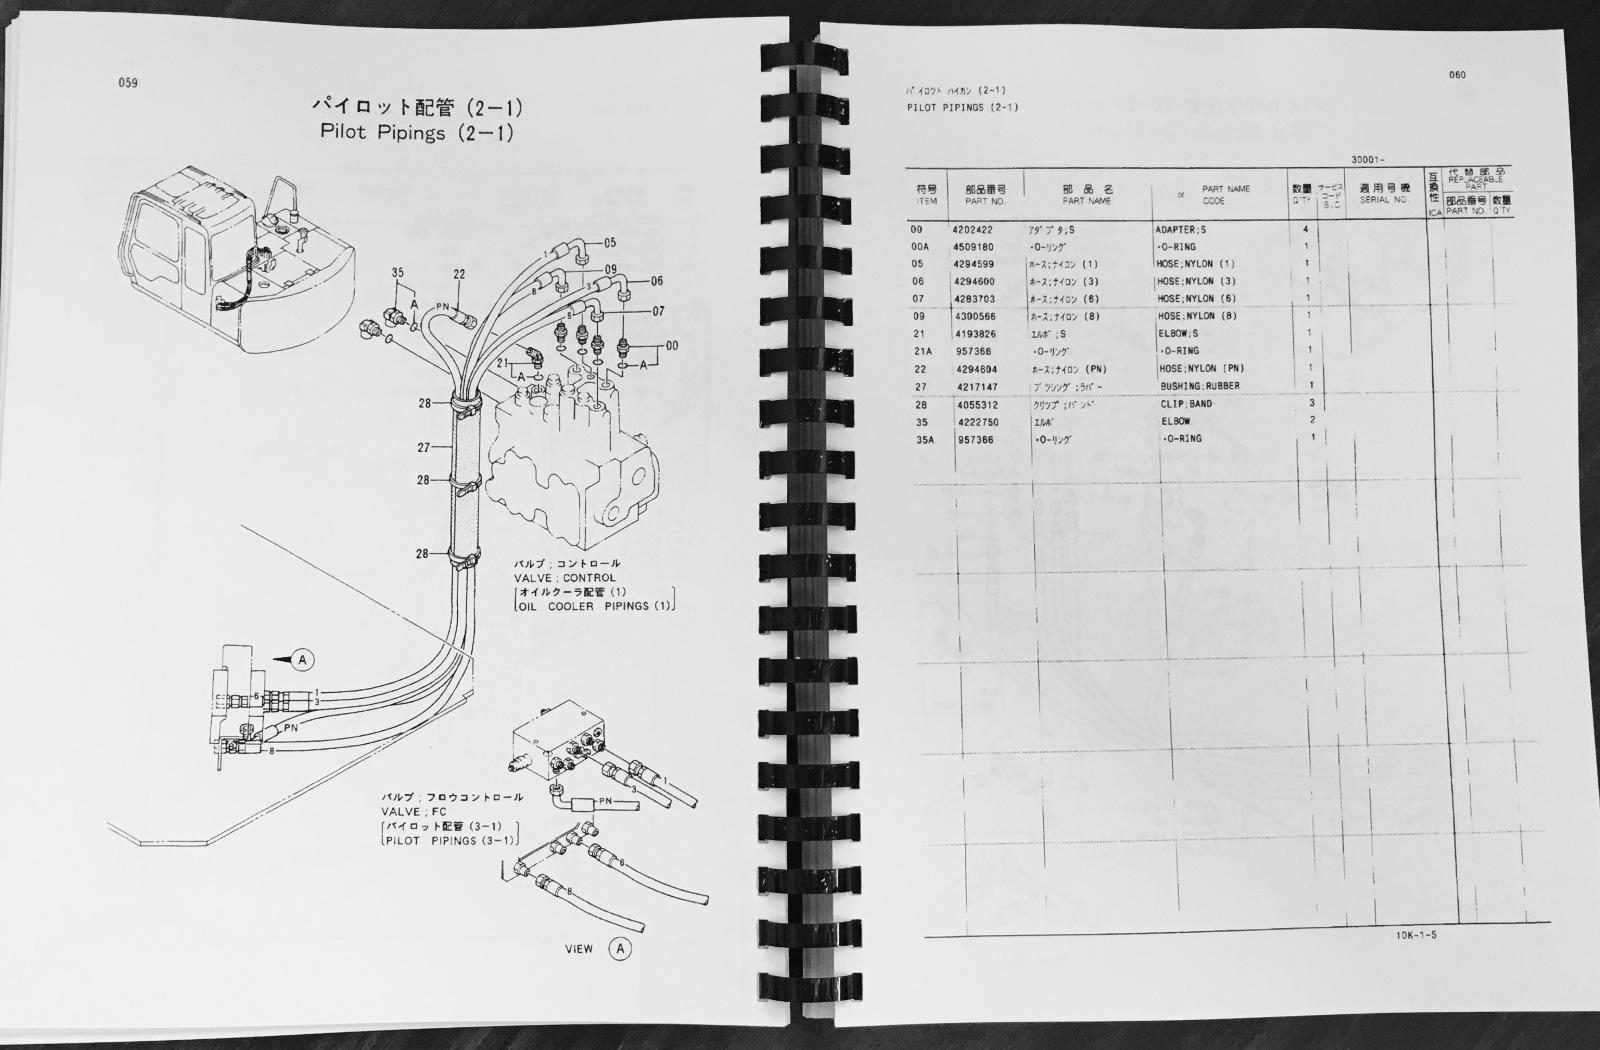 hitachi ex60 2 excavator parts manual book catalog p10k 1 5 p10k15 rh finneyparts us Hitachi Construction Equipment Manuals hitachi excavator parts manual pdf